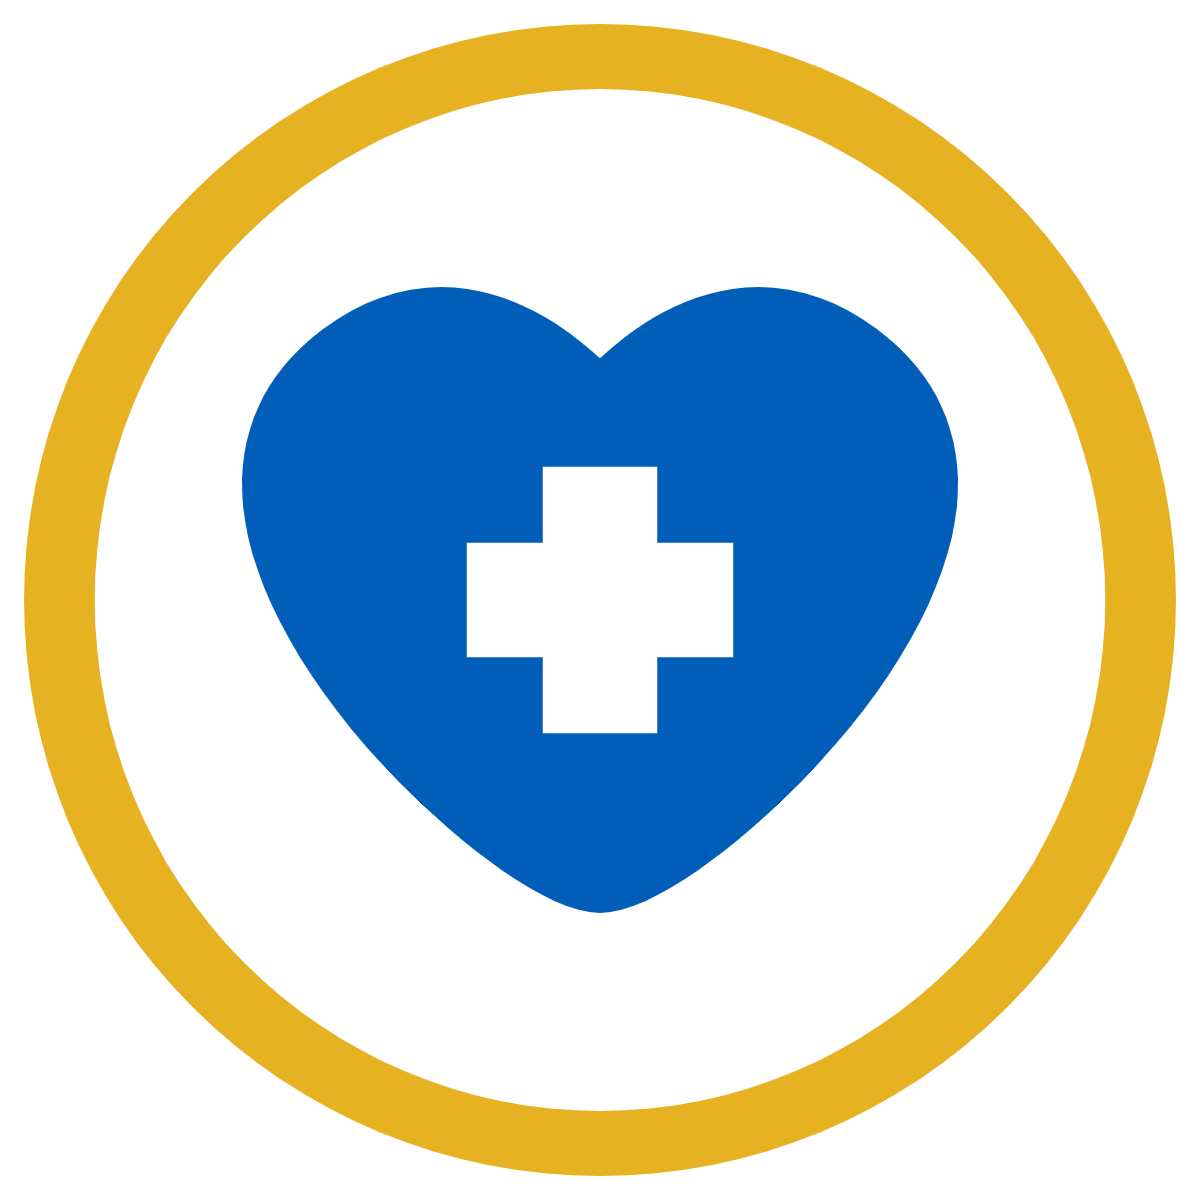 Heart health cardiac rehab icon